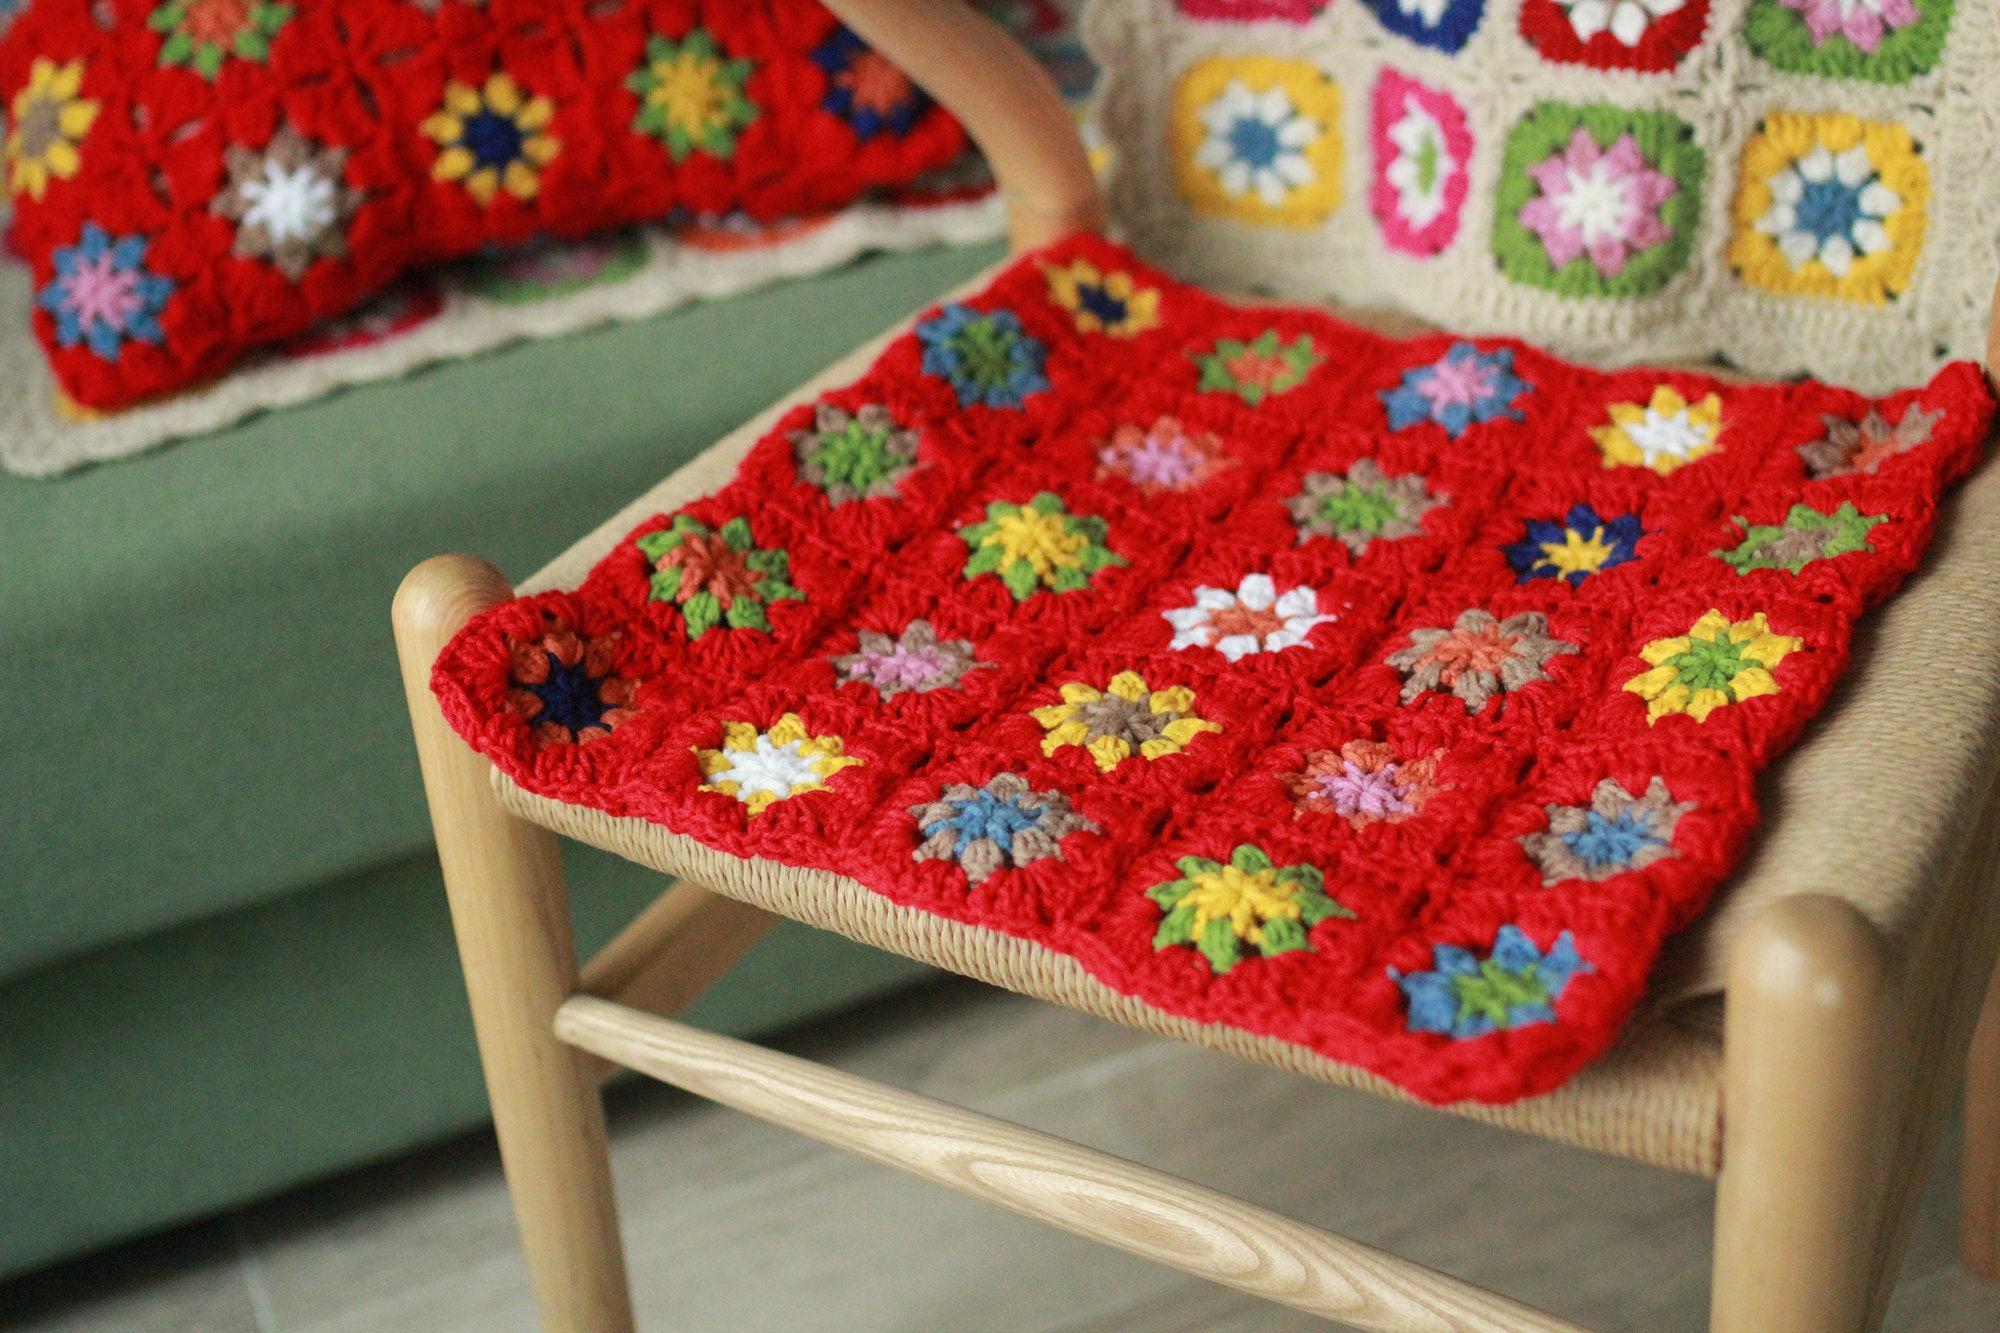 Granny Square Crochet Cushions100%HandmadeRed